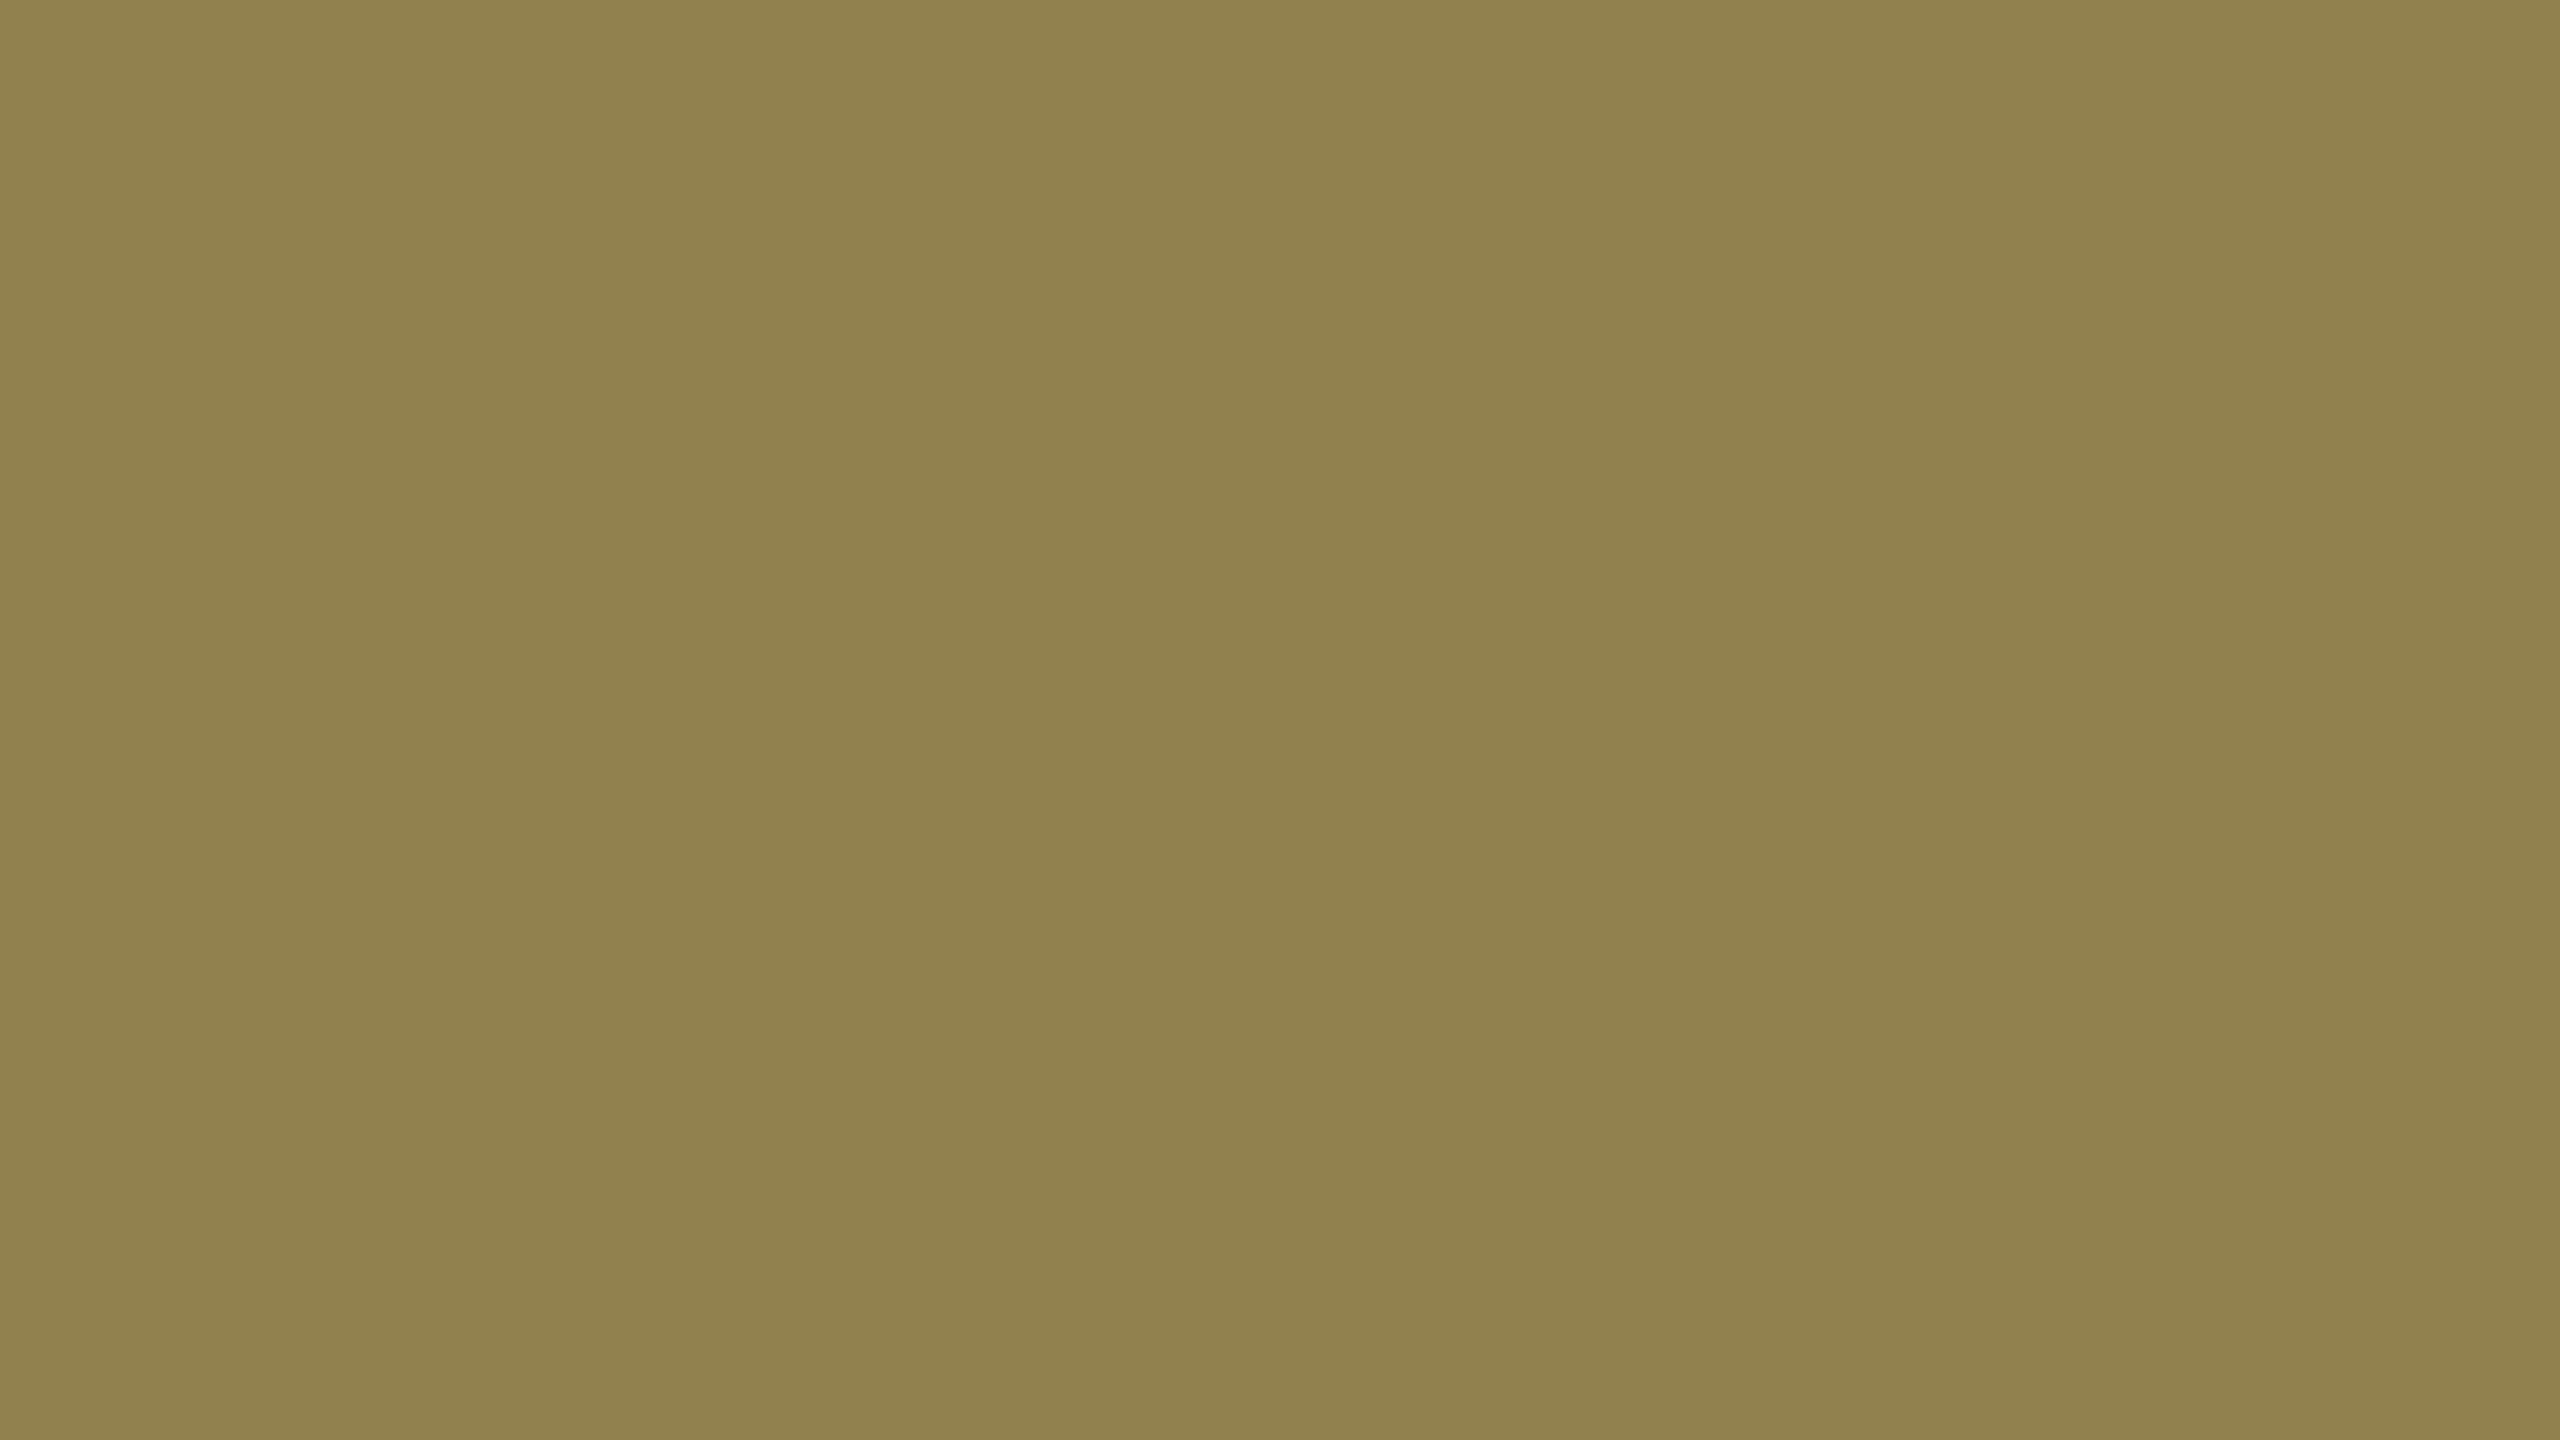 2560x1440 Dark Tan Solid Color Background